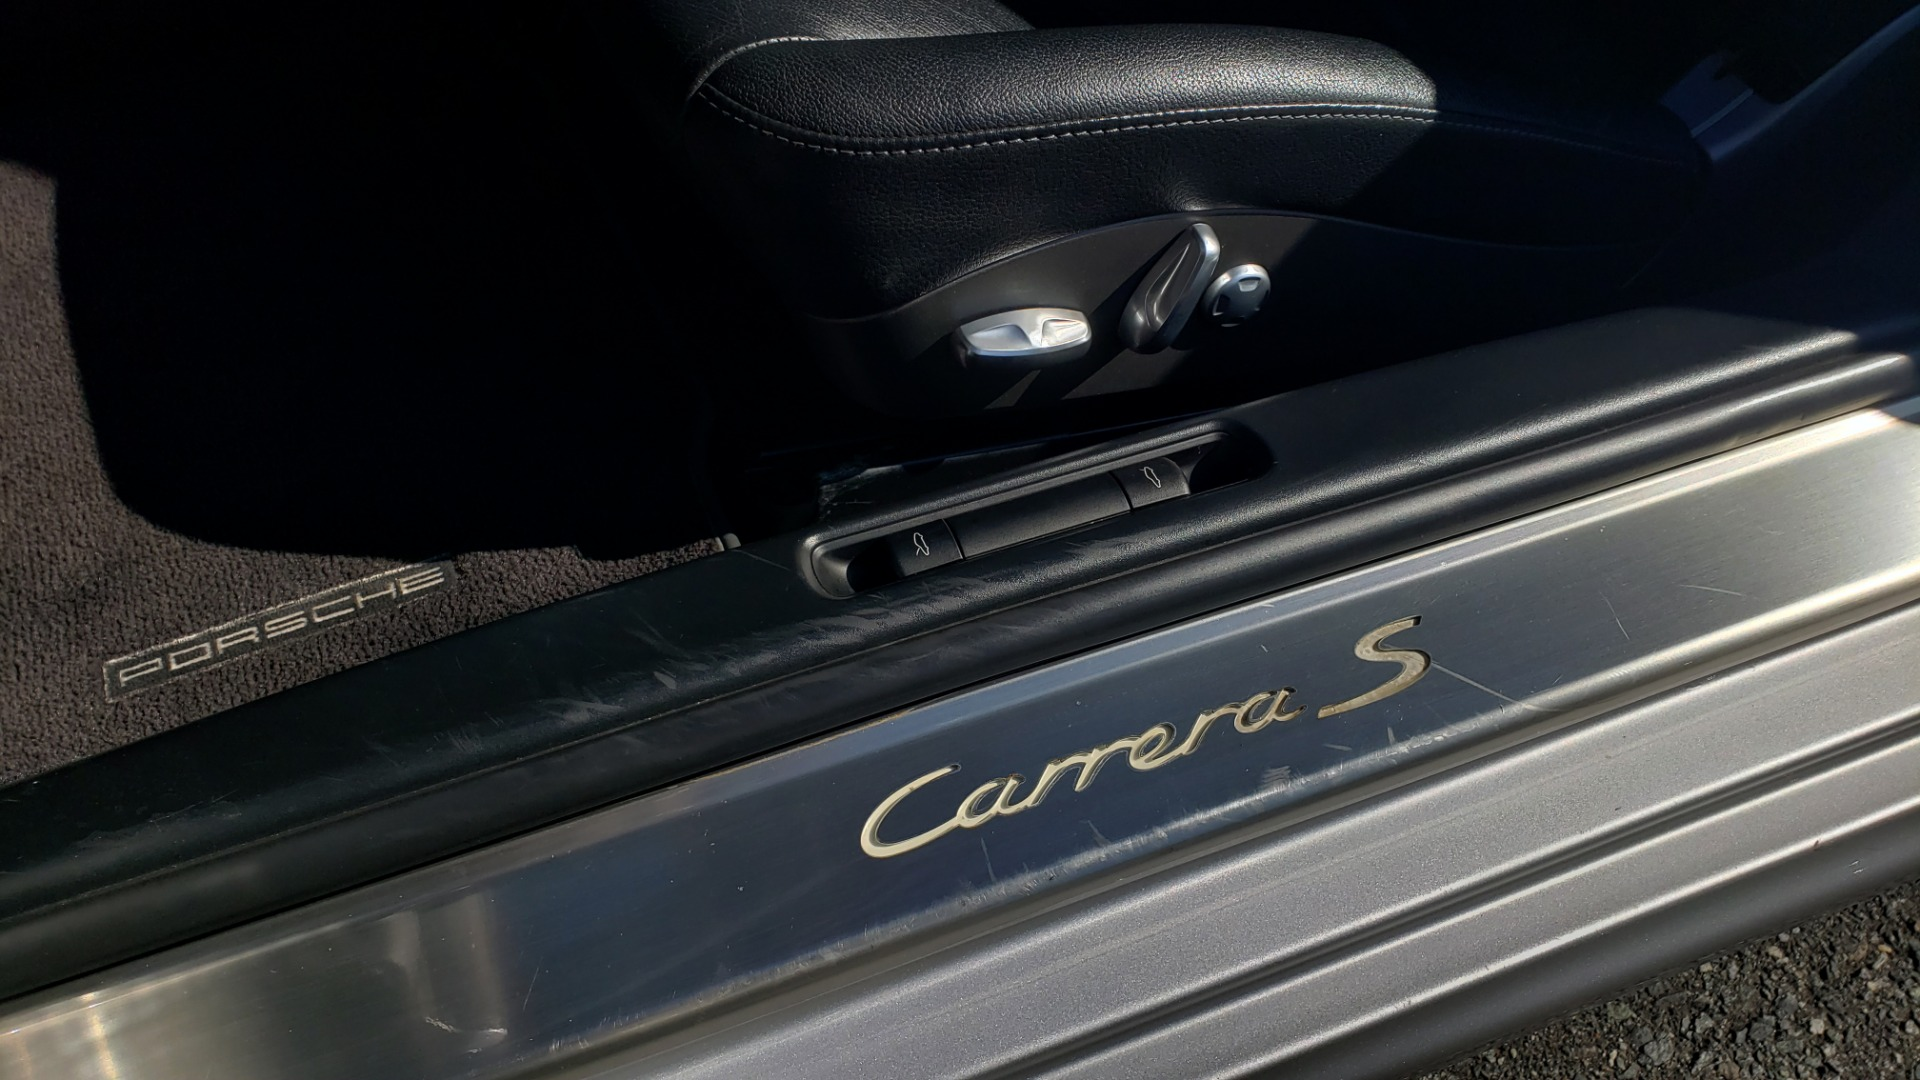 Used 2006 Porsche 911 CARRERA S / 5-SPD AUTO / SPORT CHRONO / NAV / BOSE / SUNROOF for sale Sold at Formula Imports in Charlotte NC 28227 30